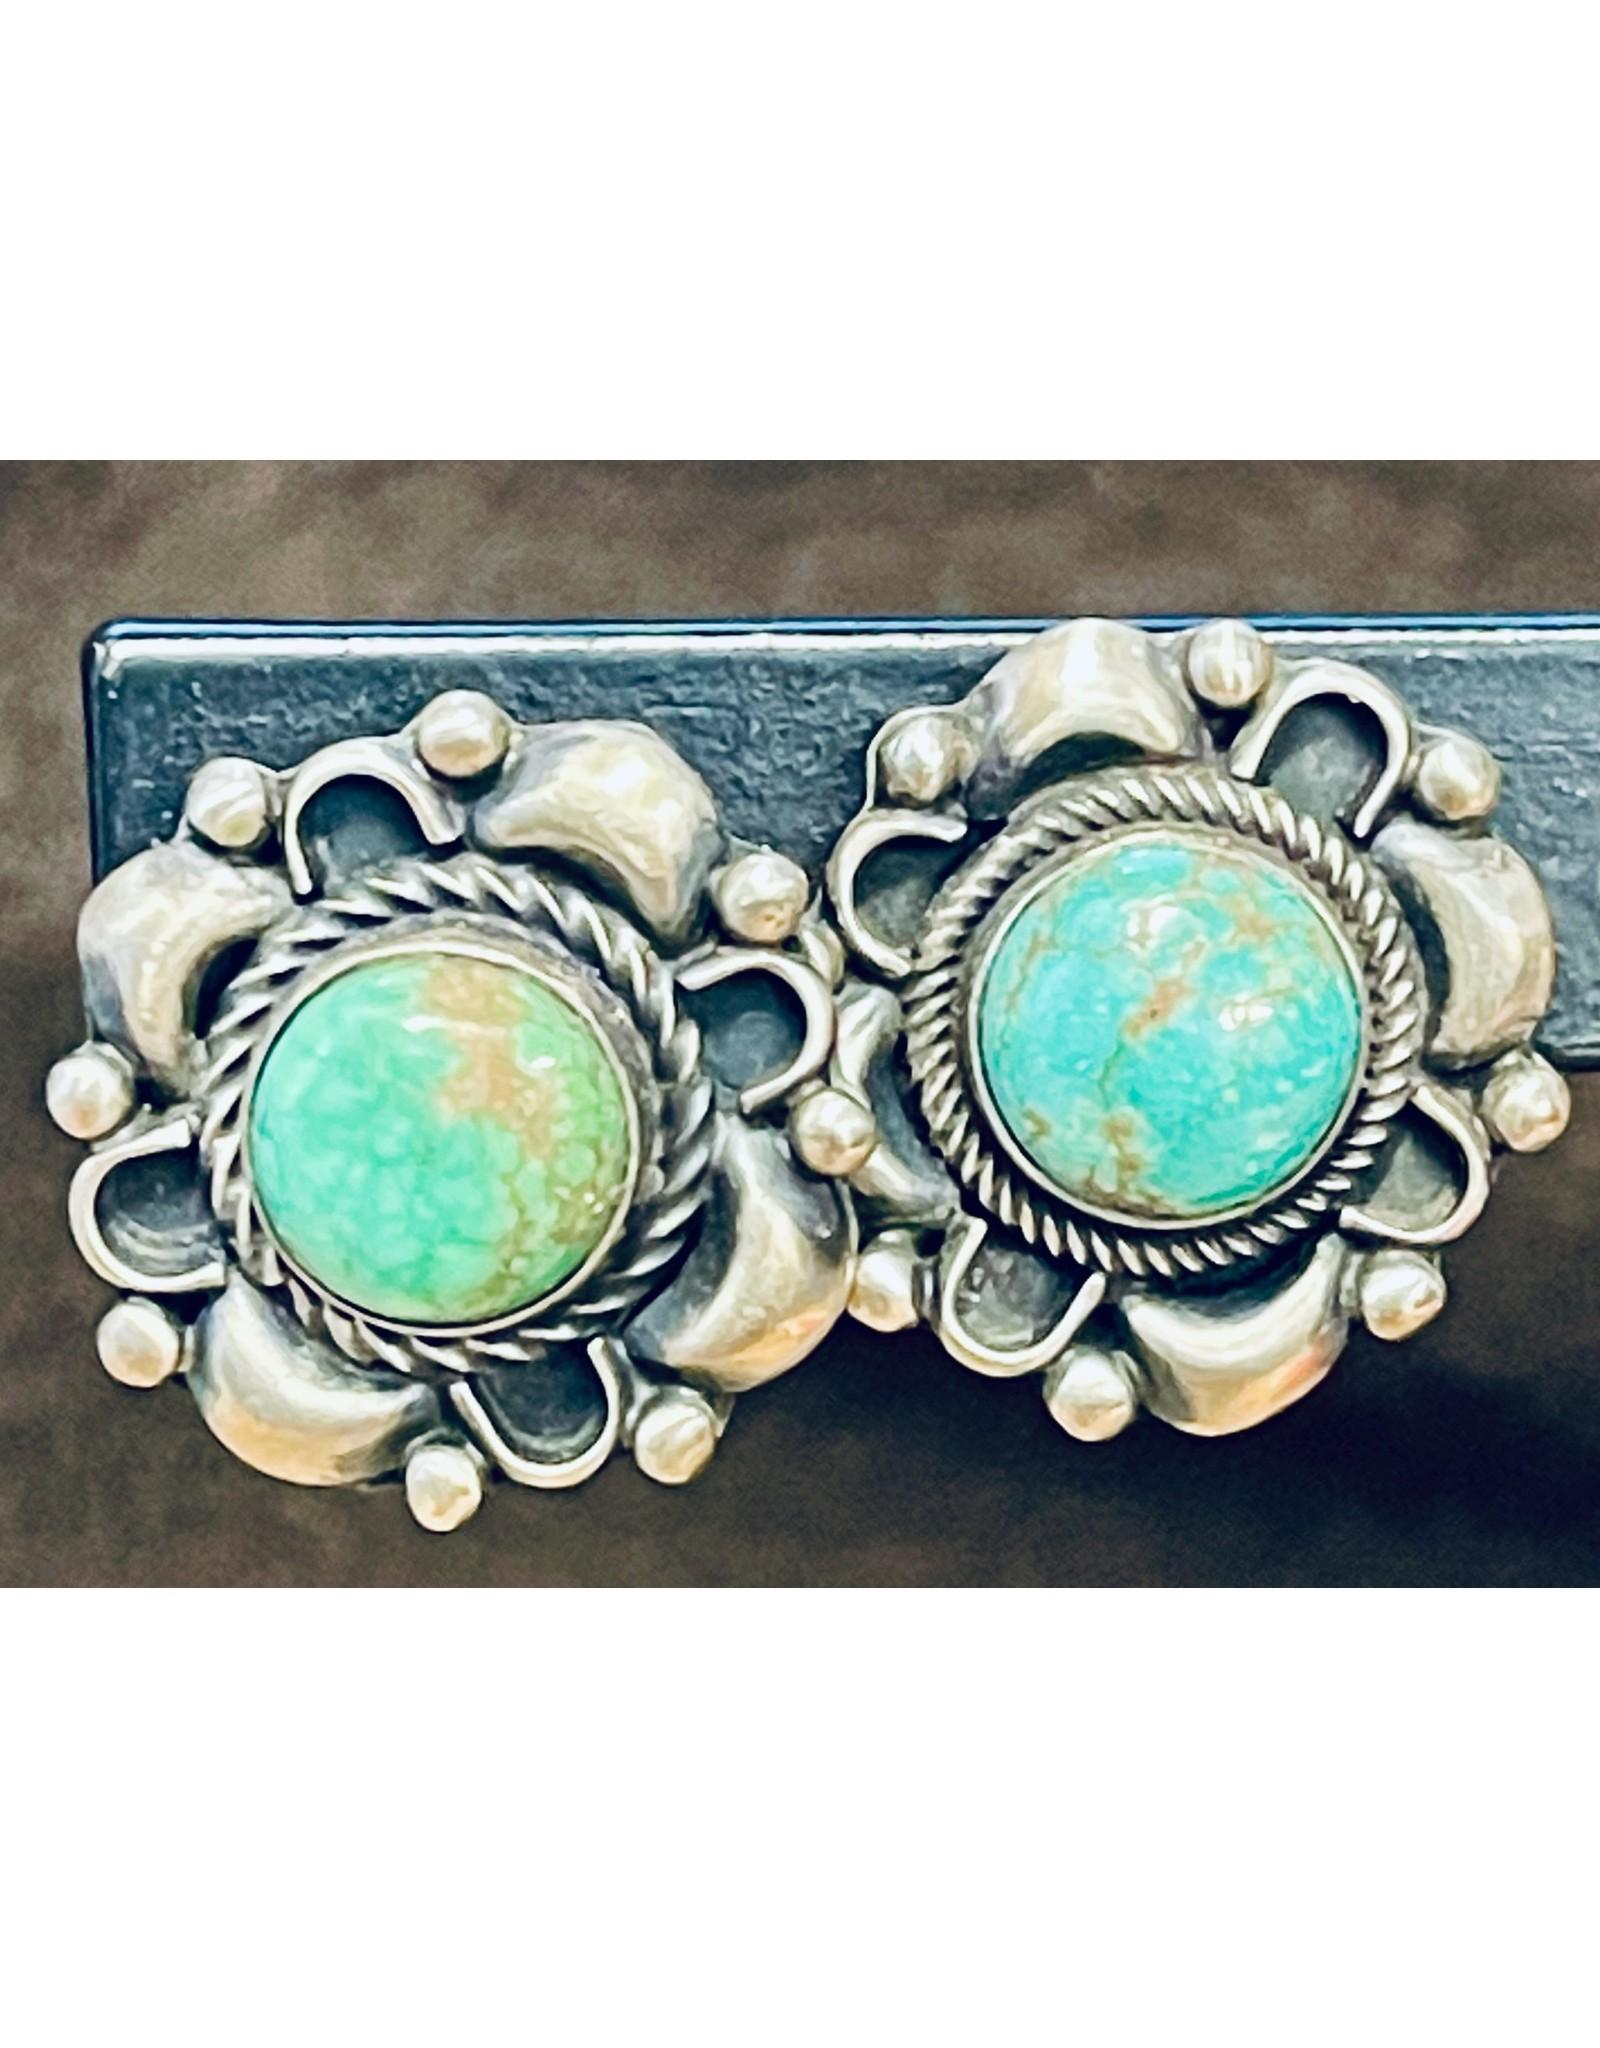 Rare Finds KINGMAN TURQUOISE & STERLING EARRINGS, post, Native American Artist Design, RARE